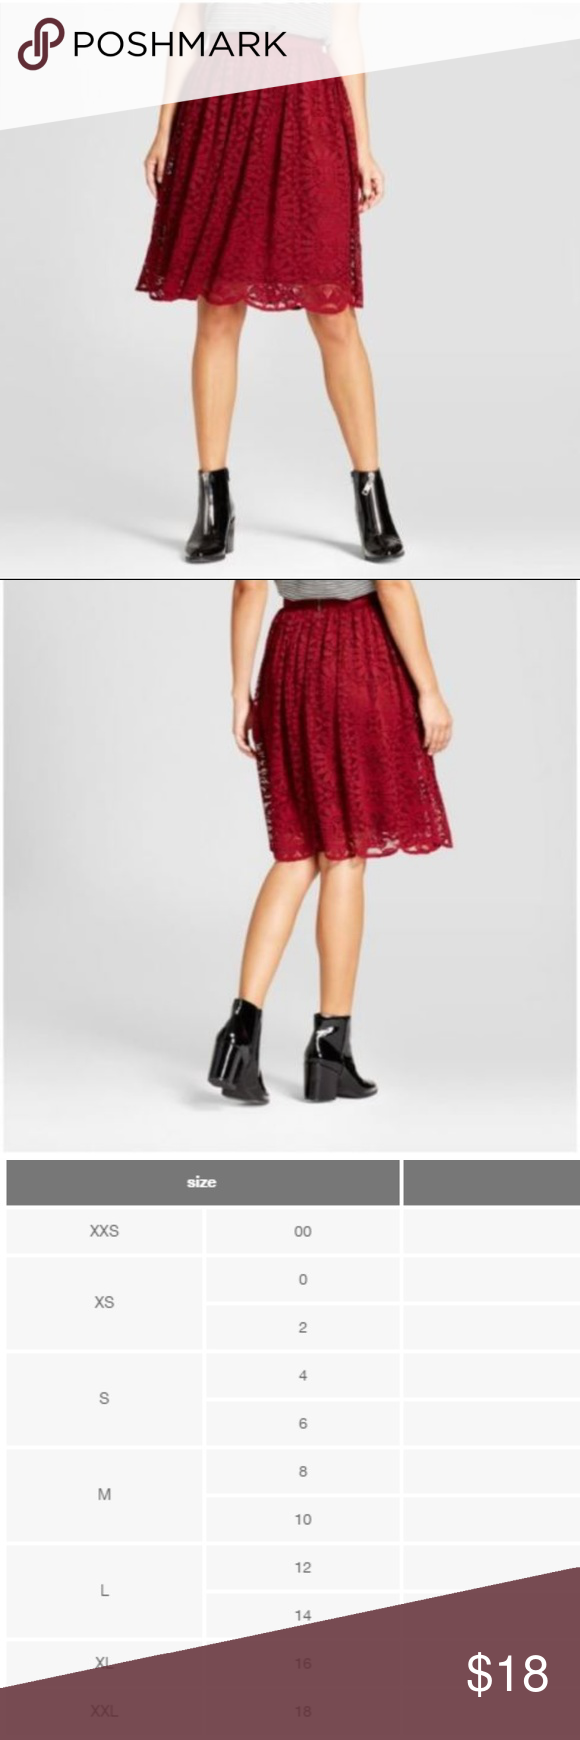 a515ab4eeb Lace Midi Skirt Ruby Rose Red Knee Length Lace Midi Skirt Xhilaration  Juniors Ruby Rose Red Knee Length Sz Medium Maroon Xhilaration Skirts Midi